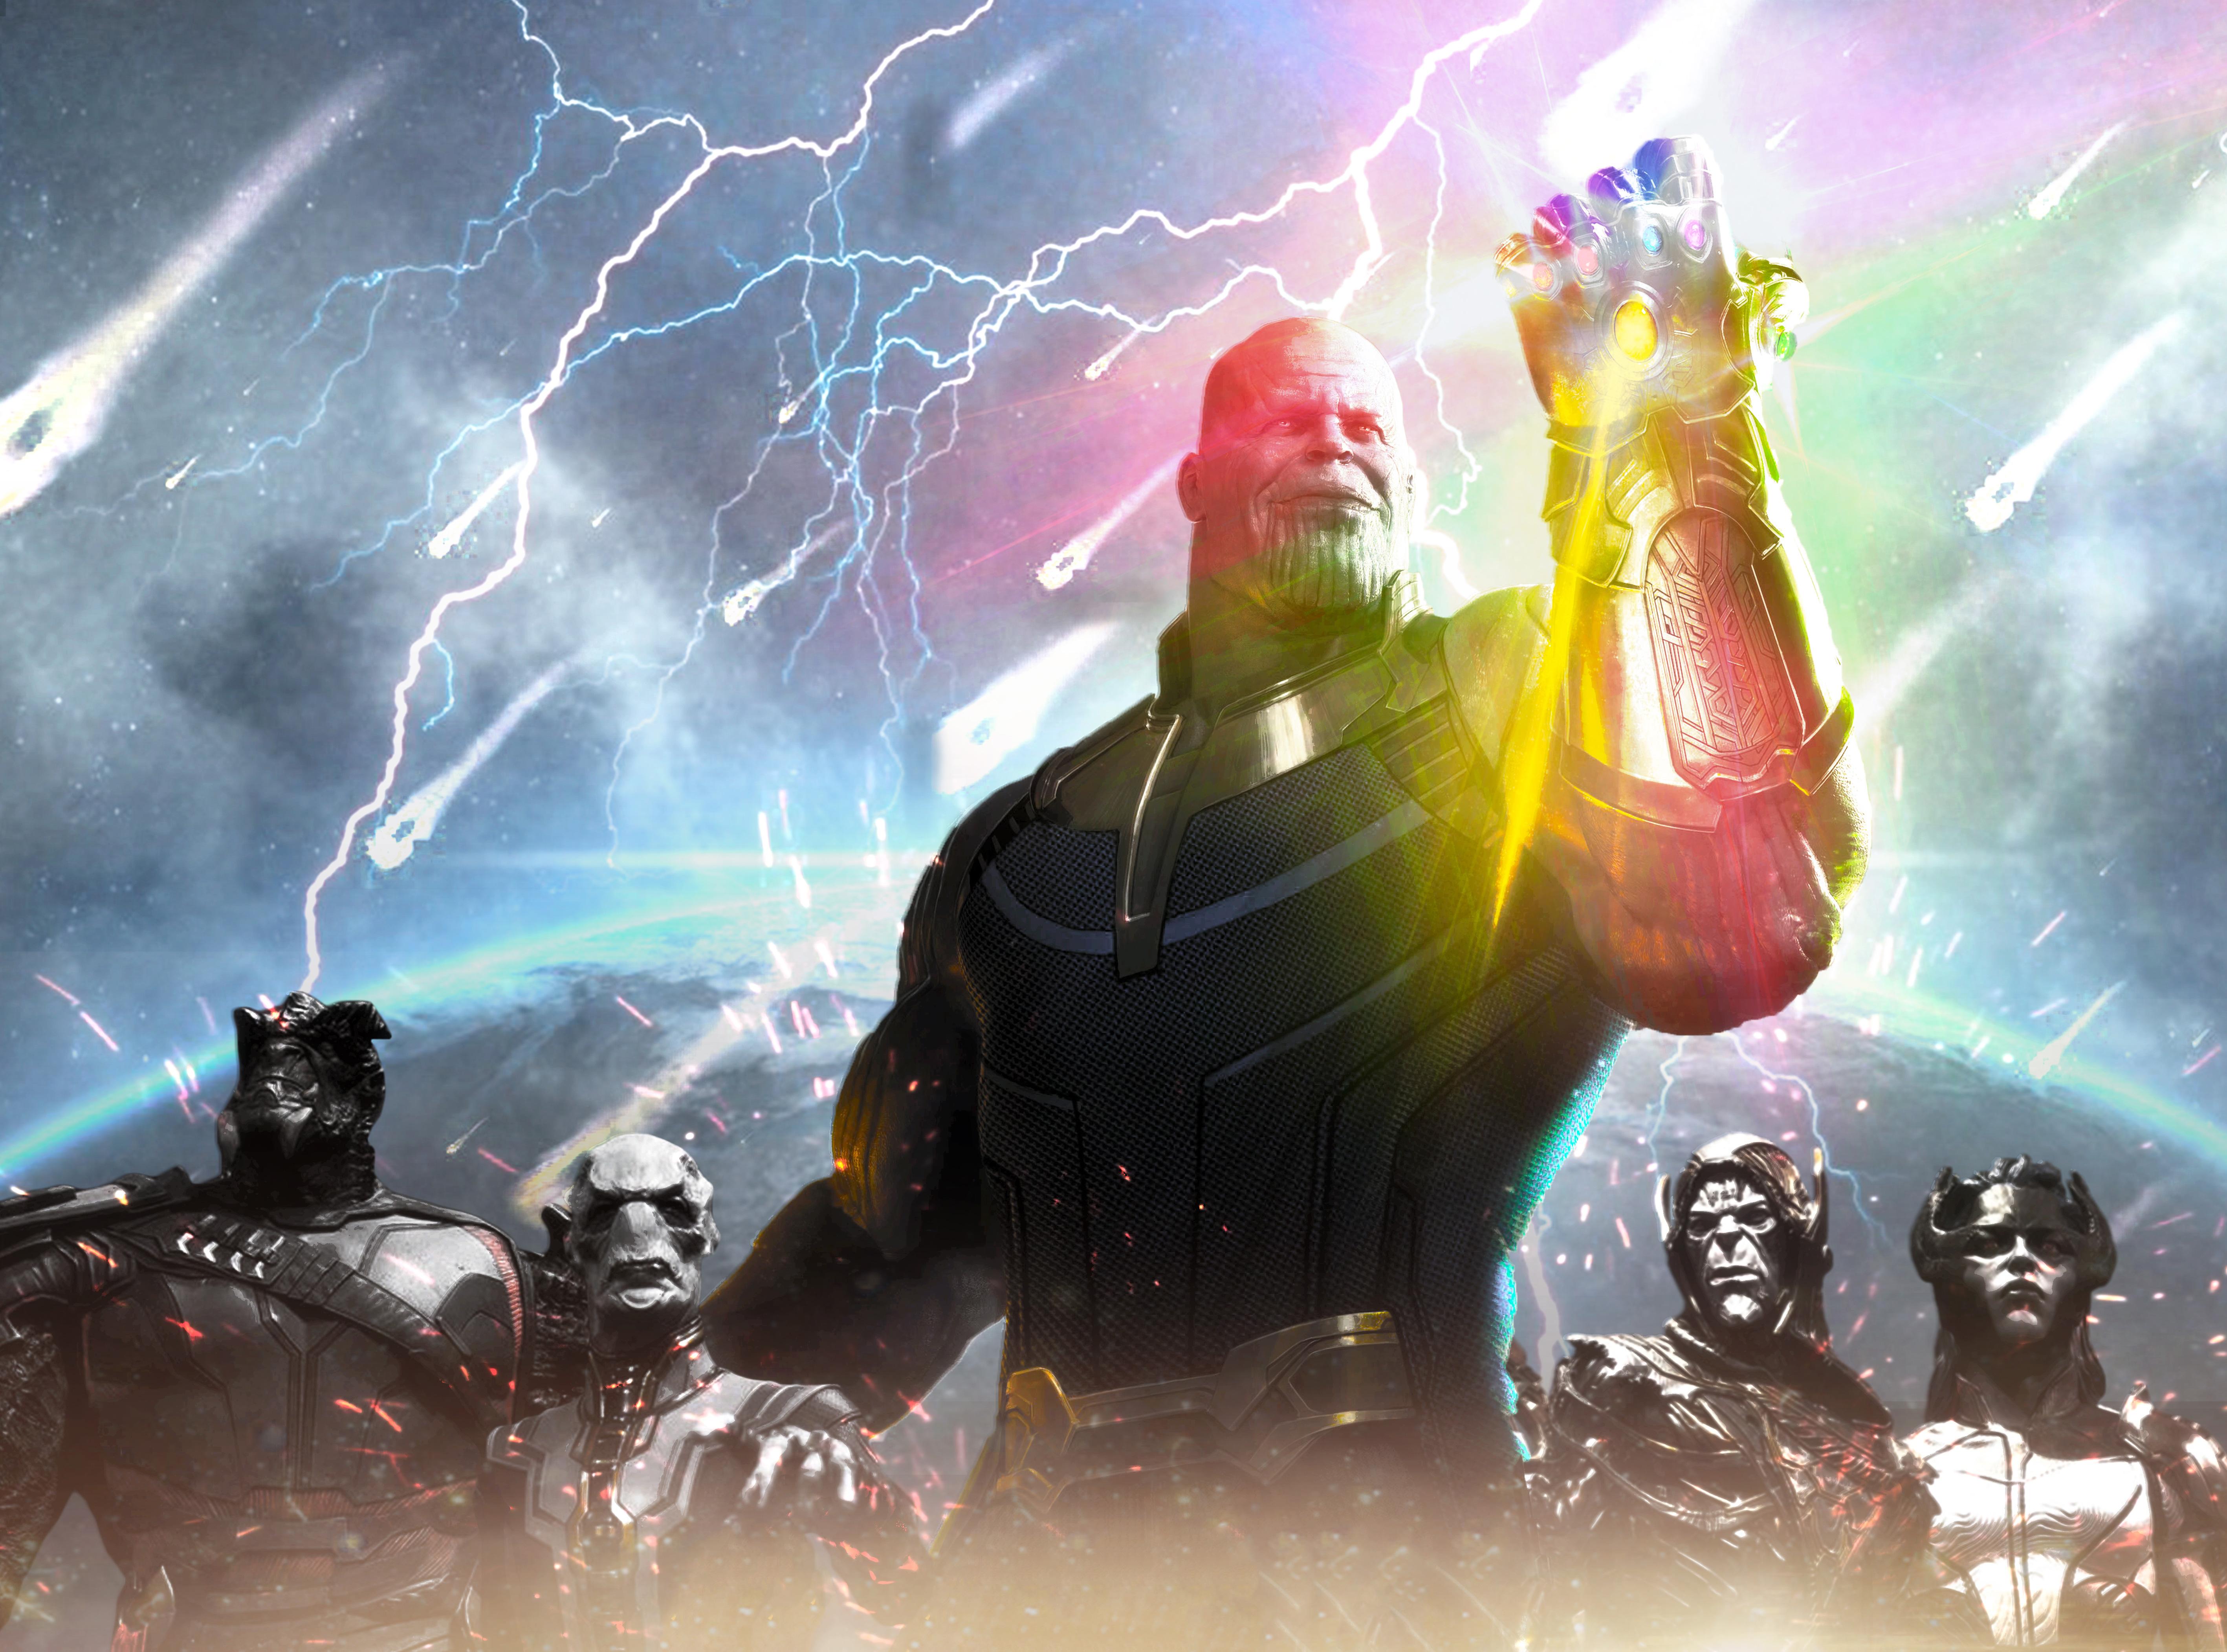 Wallpaper Thanos Avengers Infinity War Artwork Hd: Thanos Avengers Infinity War 2018 Artwork, HD Movies, 4k